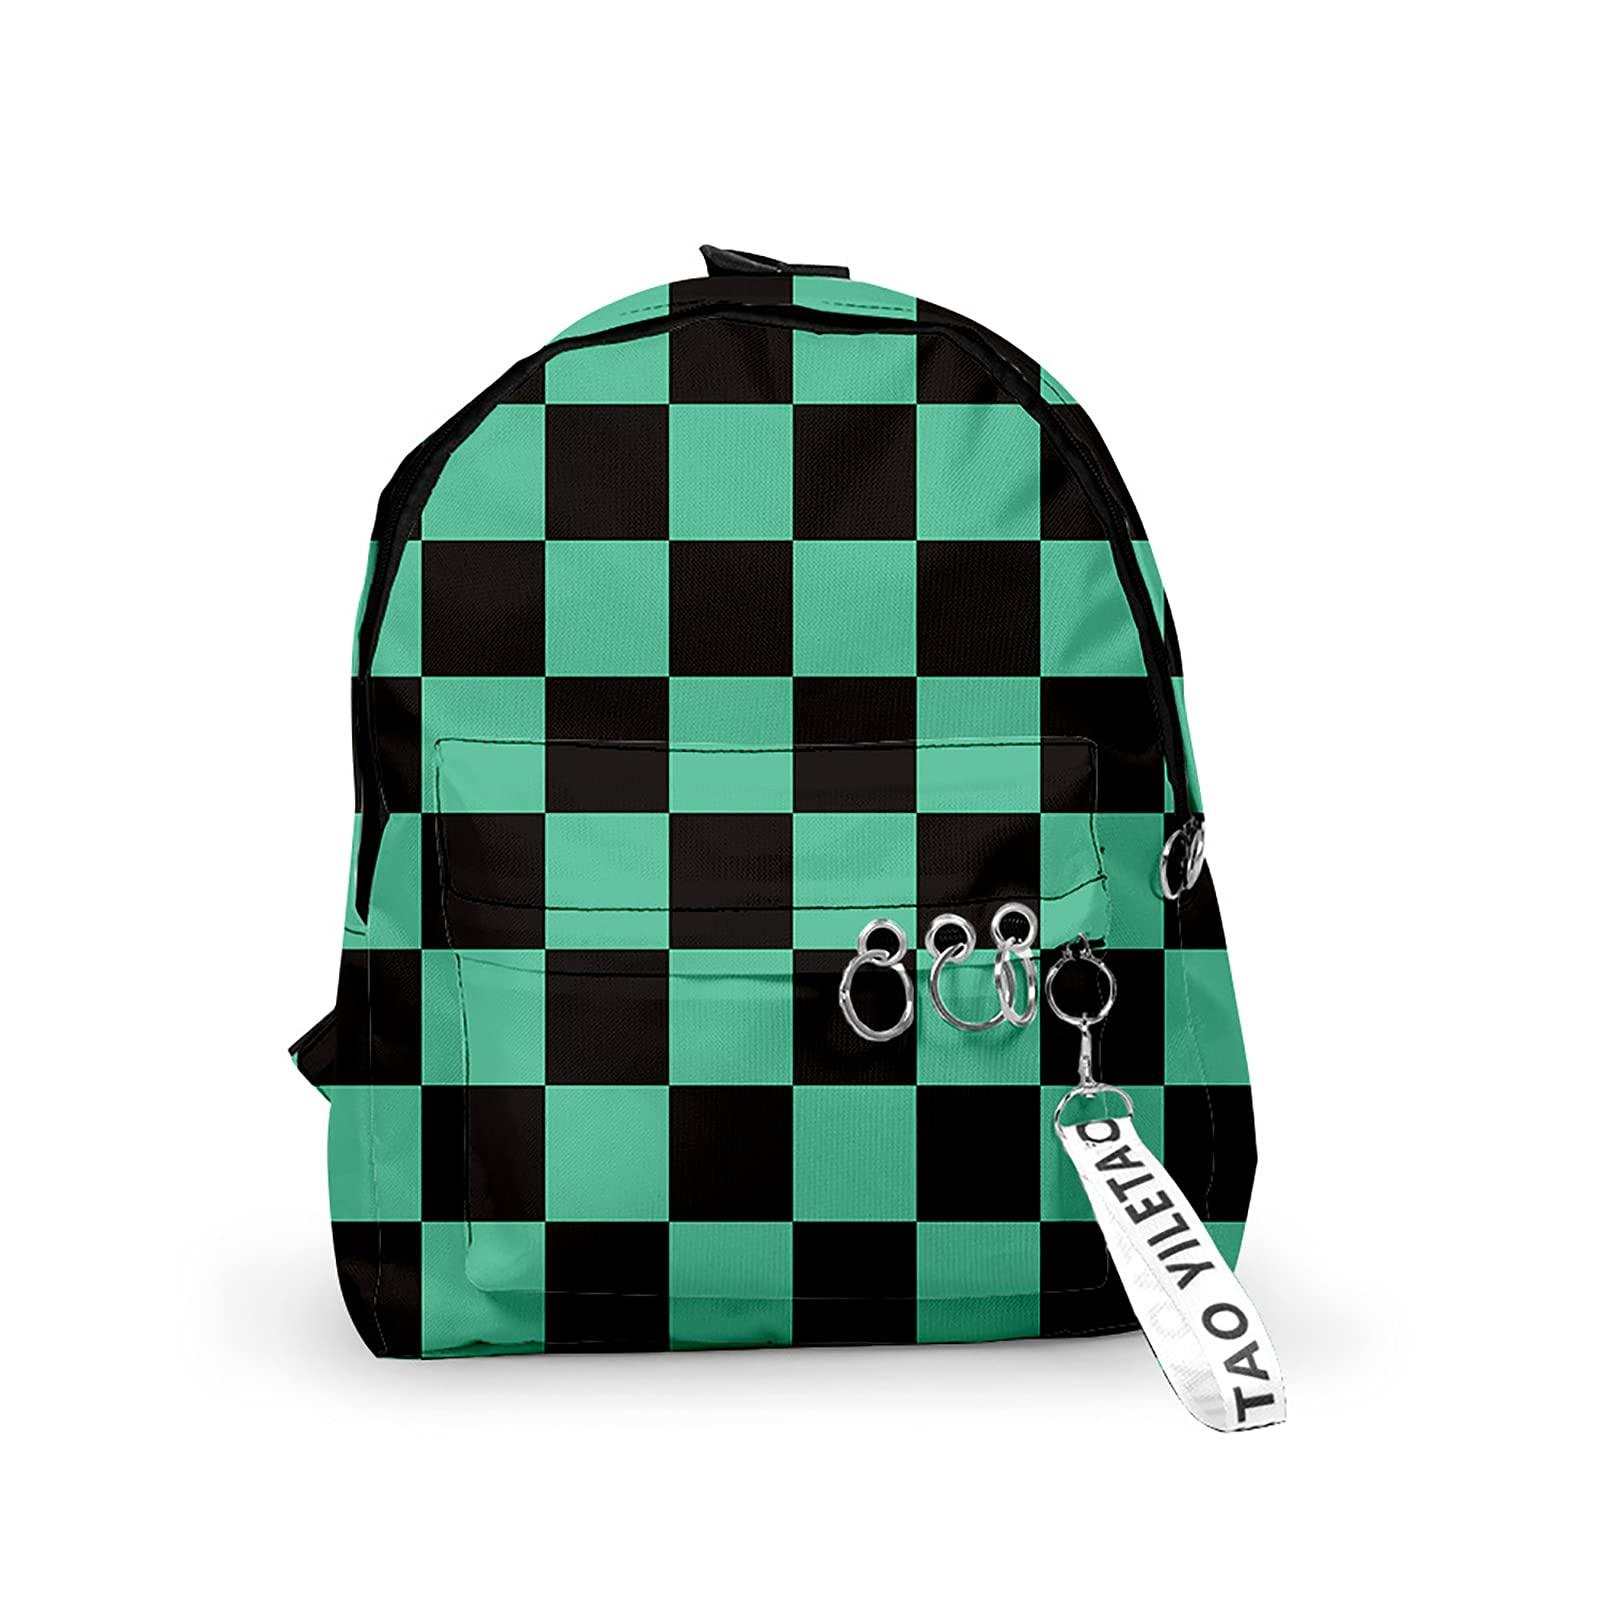 SUKLIER Demon Slayer Cosplay Backpack,For Kamado Tanjirou,Casual And Durable Children'S School Bag,For Anime Lovers,Japanese Manga Characters Bookbag Laptop Bag